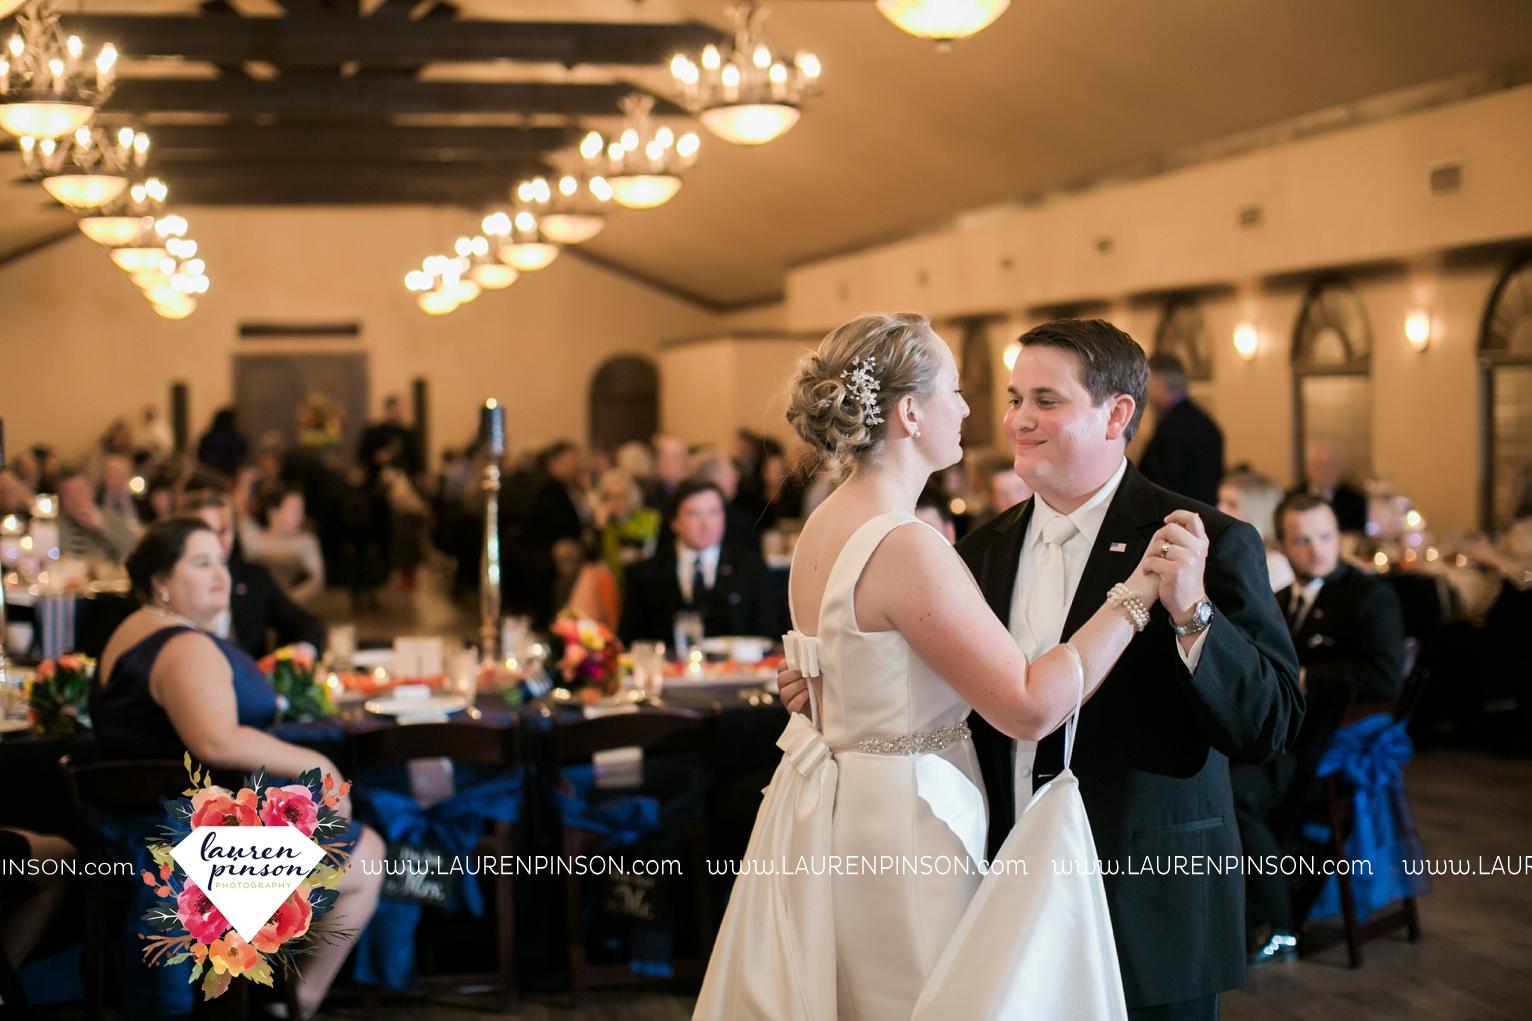 bells-texas-wedding-photography-at-willowood-ranch-chapel-north-texas-wichita-falls-wedding-photographer_1895.jpg